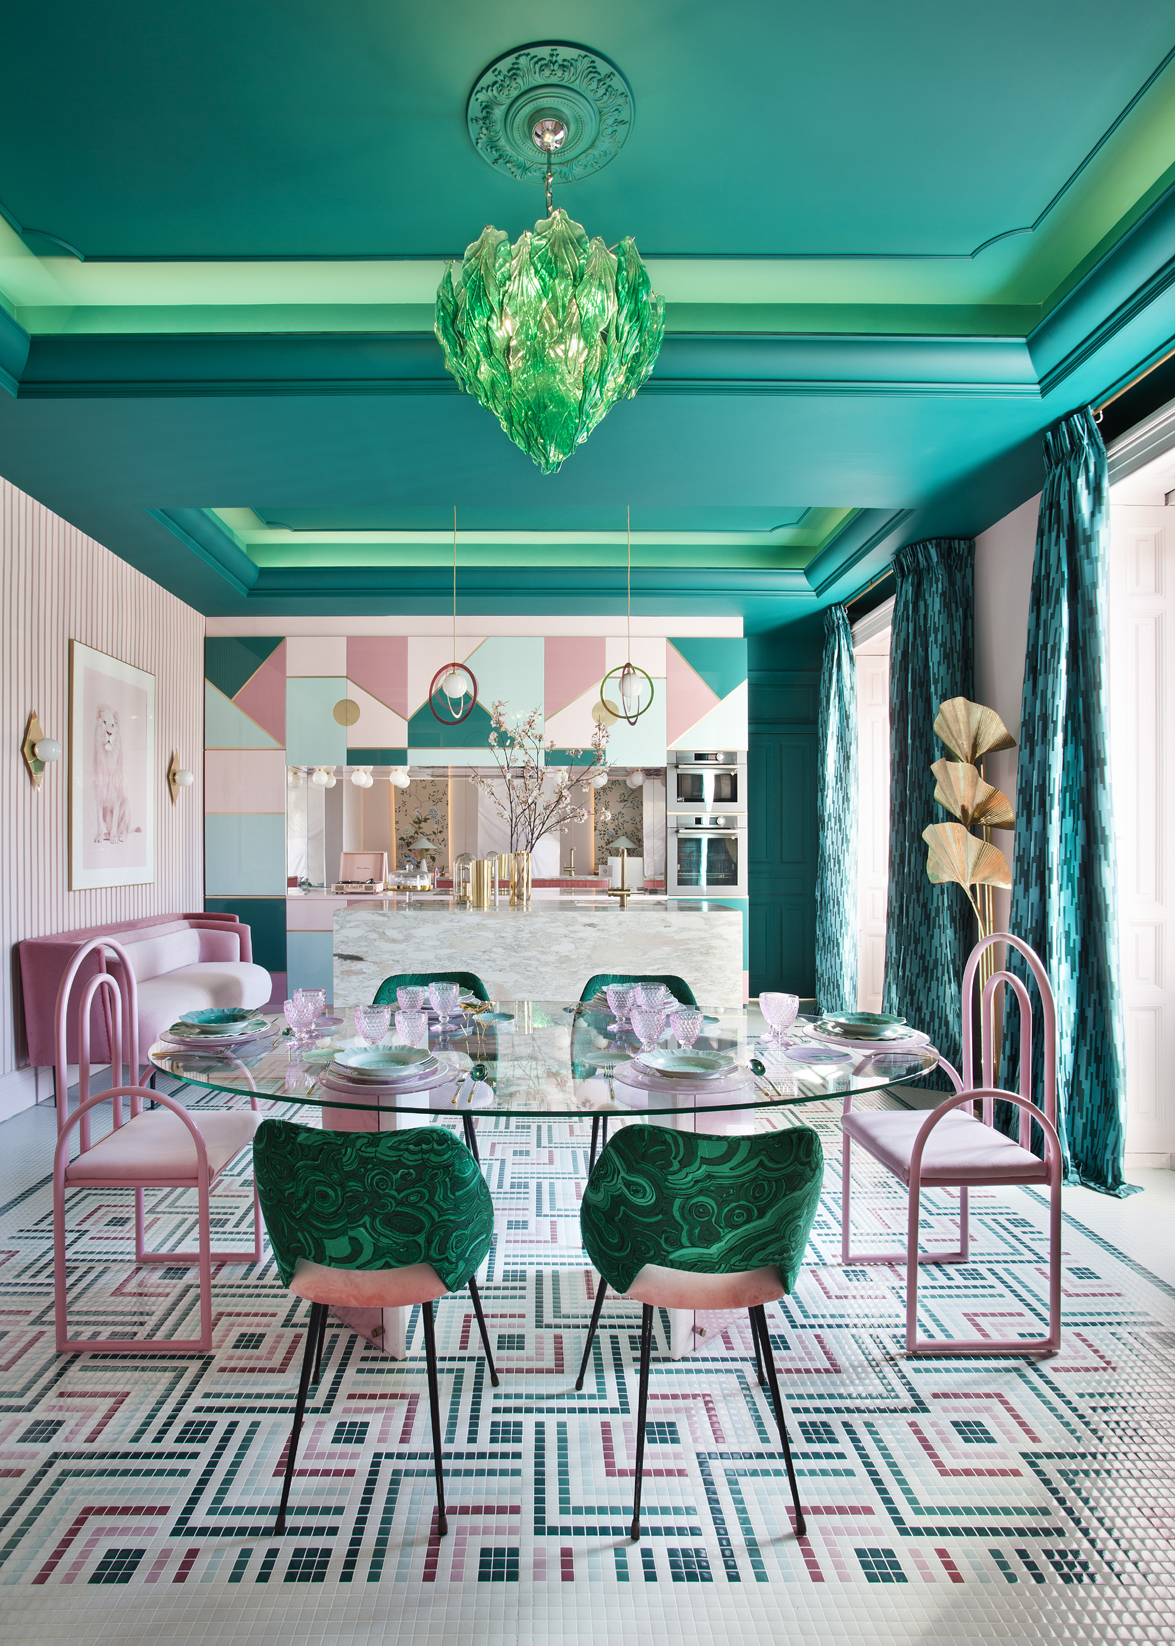 Patricia Bustos Casa Decor Madrid 2018 opens